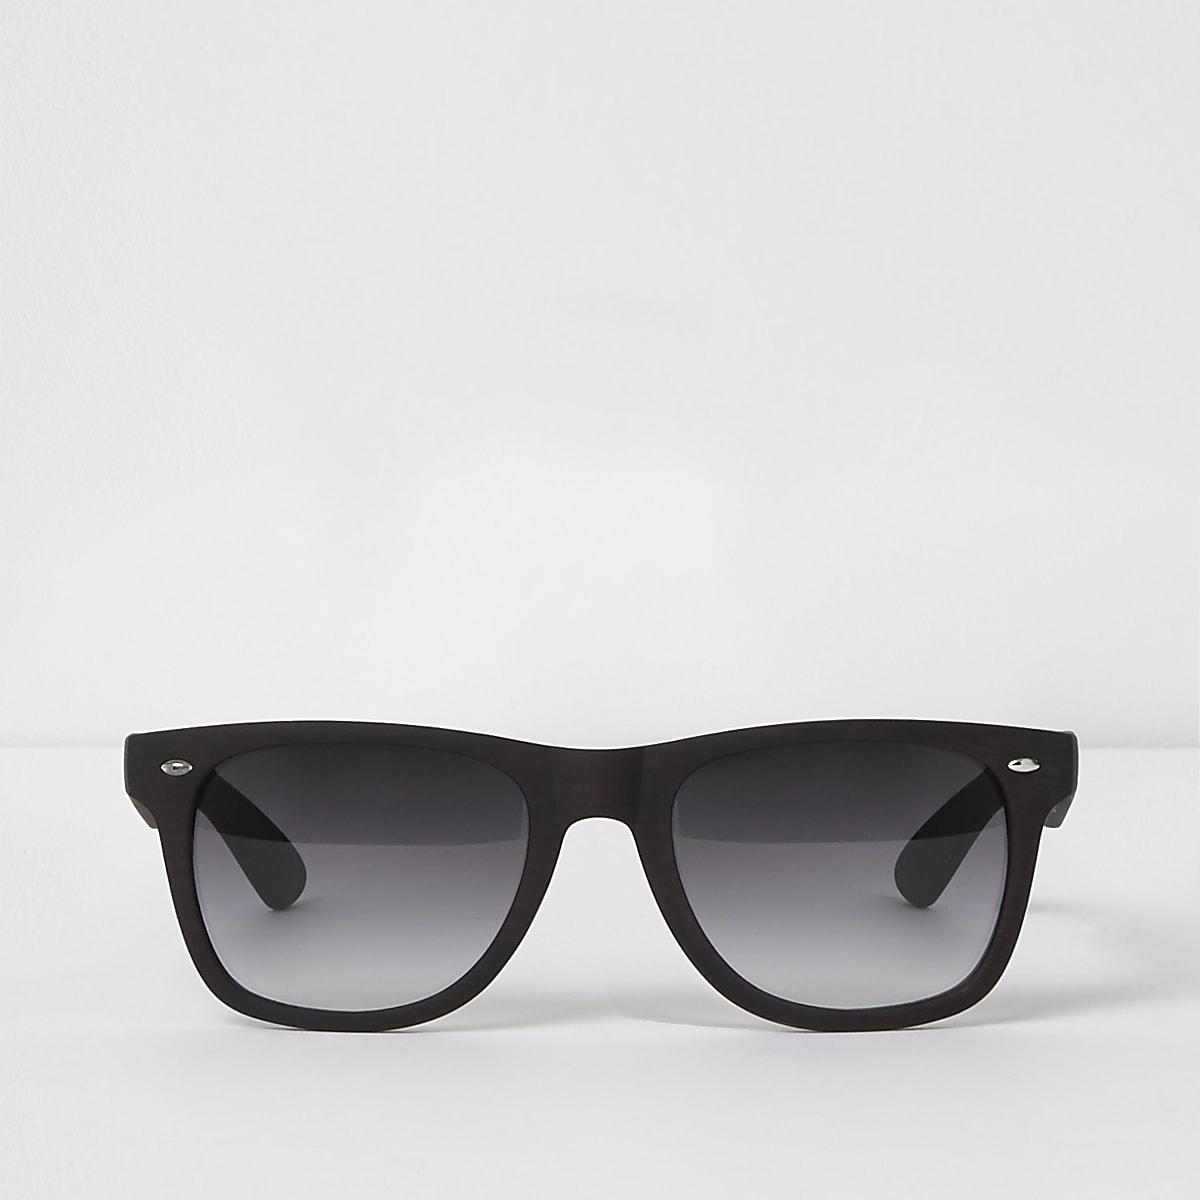 Brown wood effect retro square sunglasses